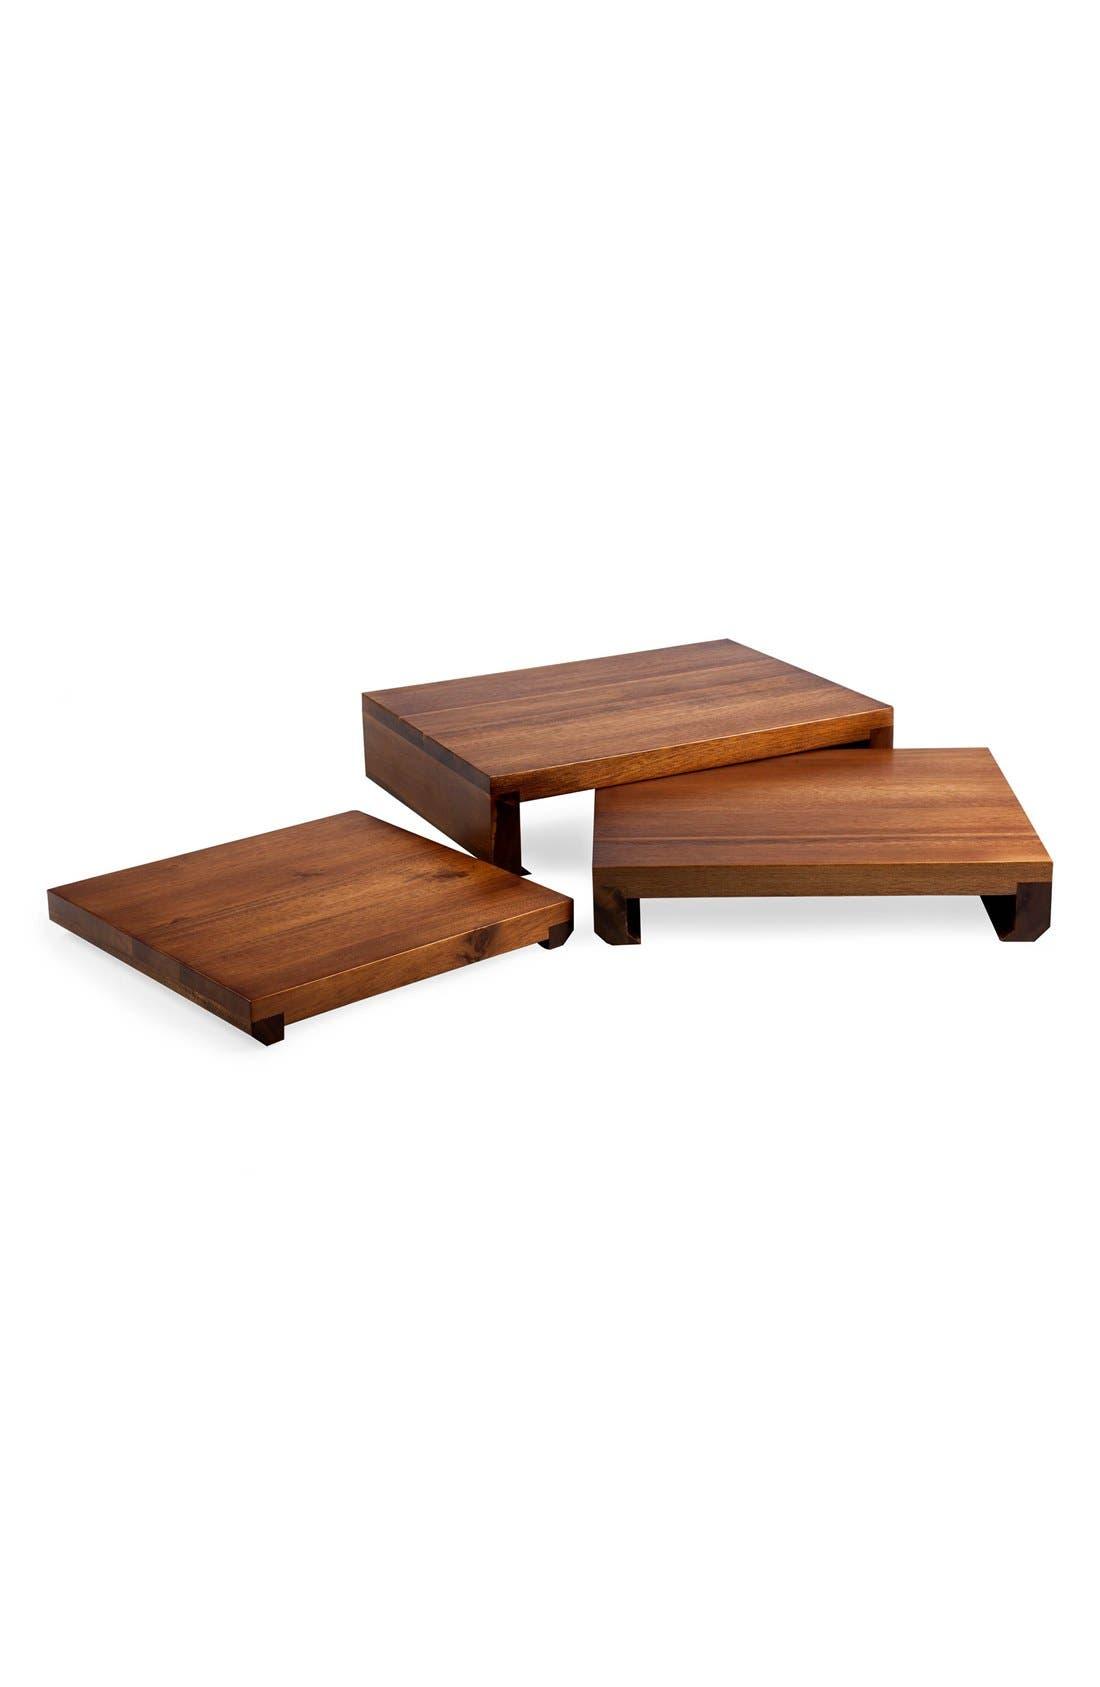 'Etage' Wood Serving Pedestals,                             Alternate thumbnail 2, color,                             200